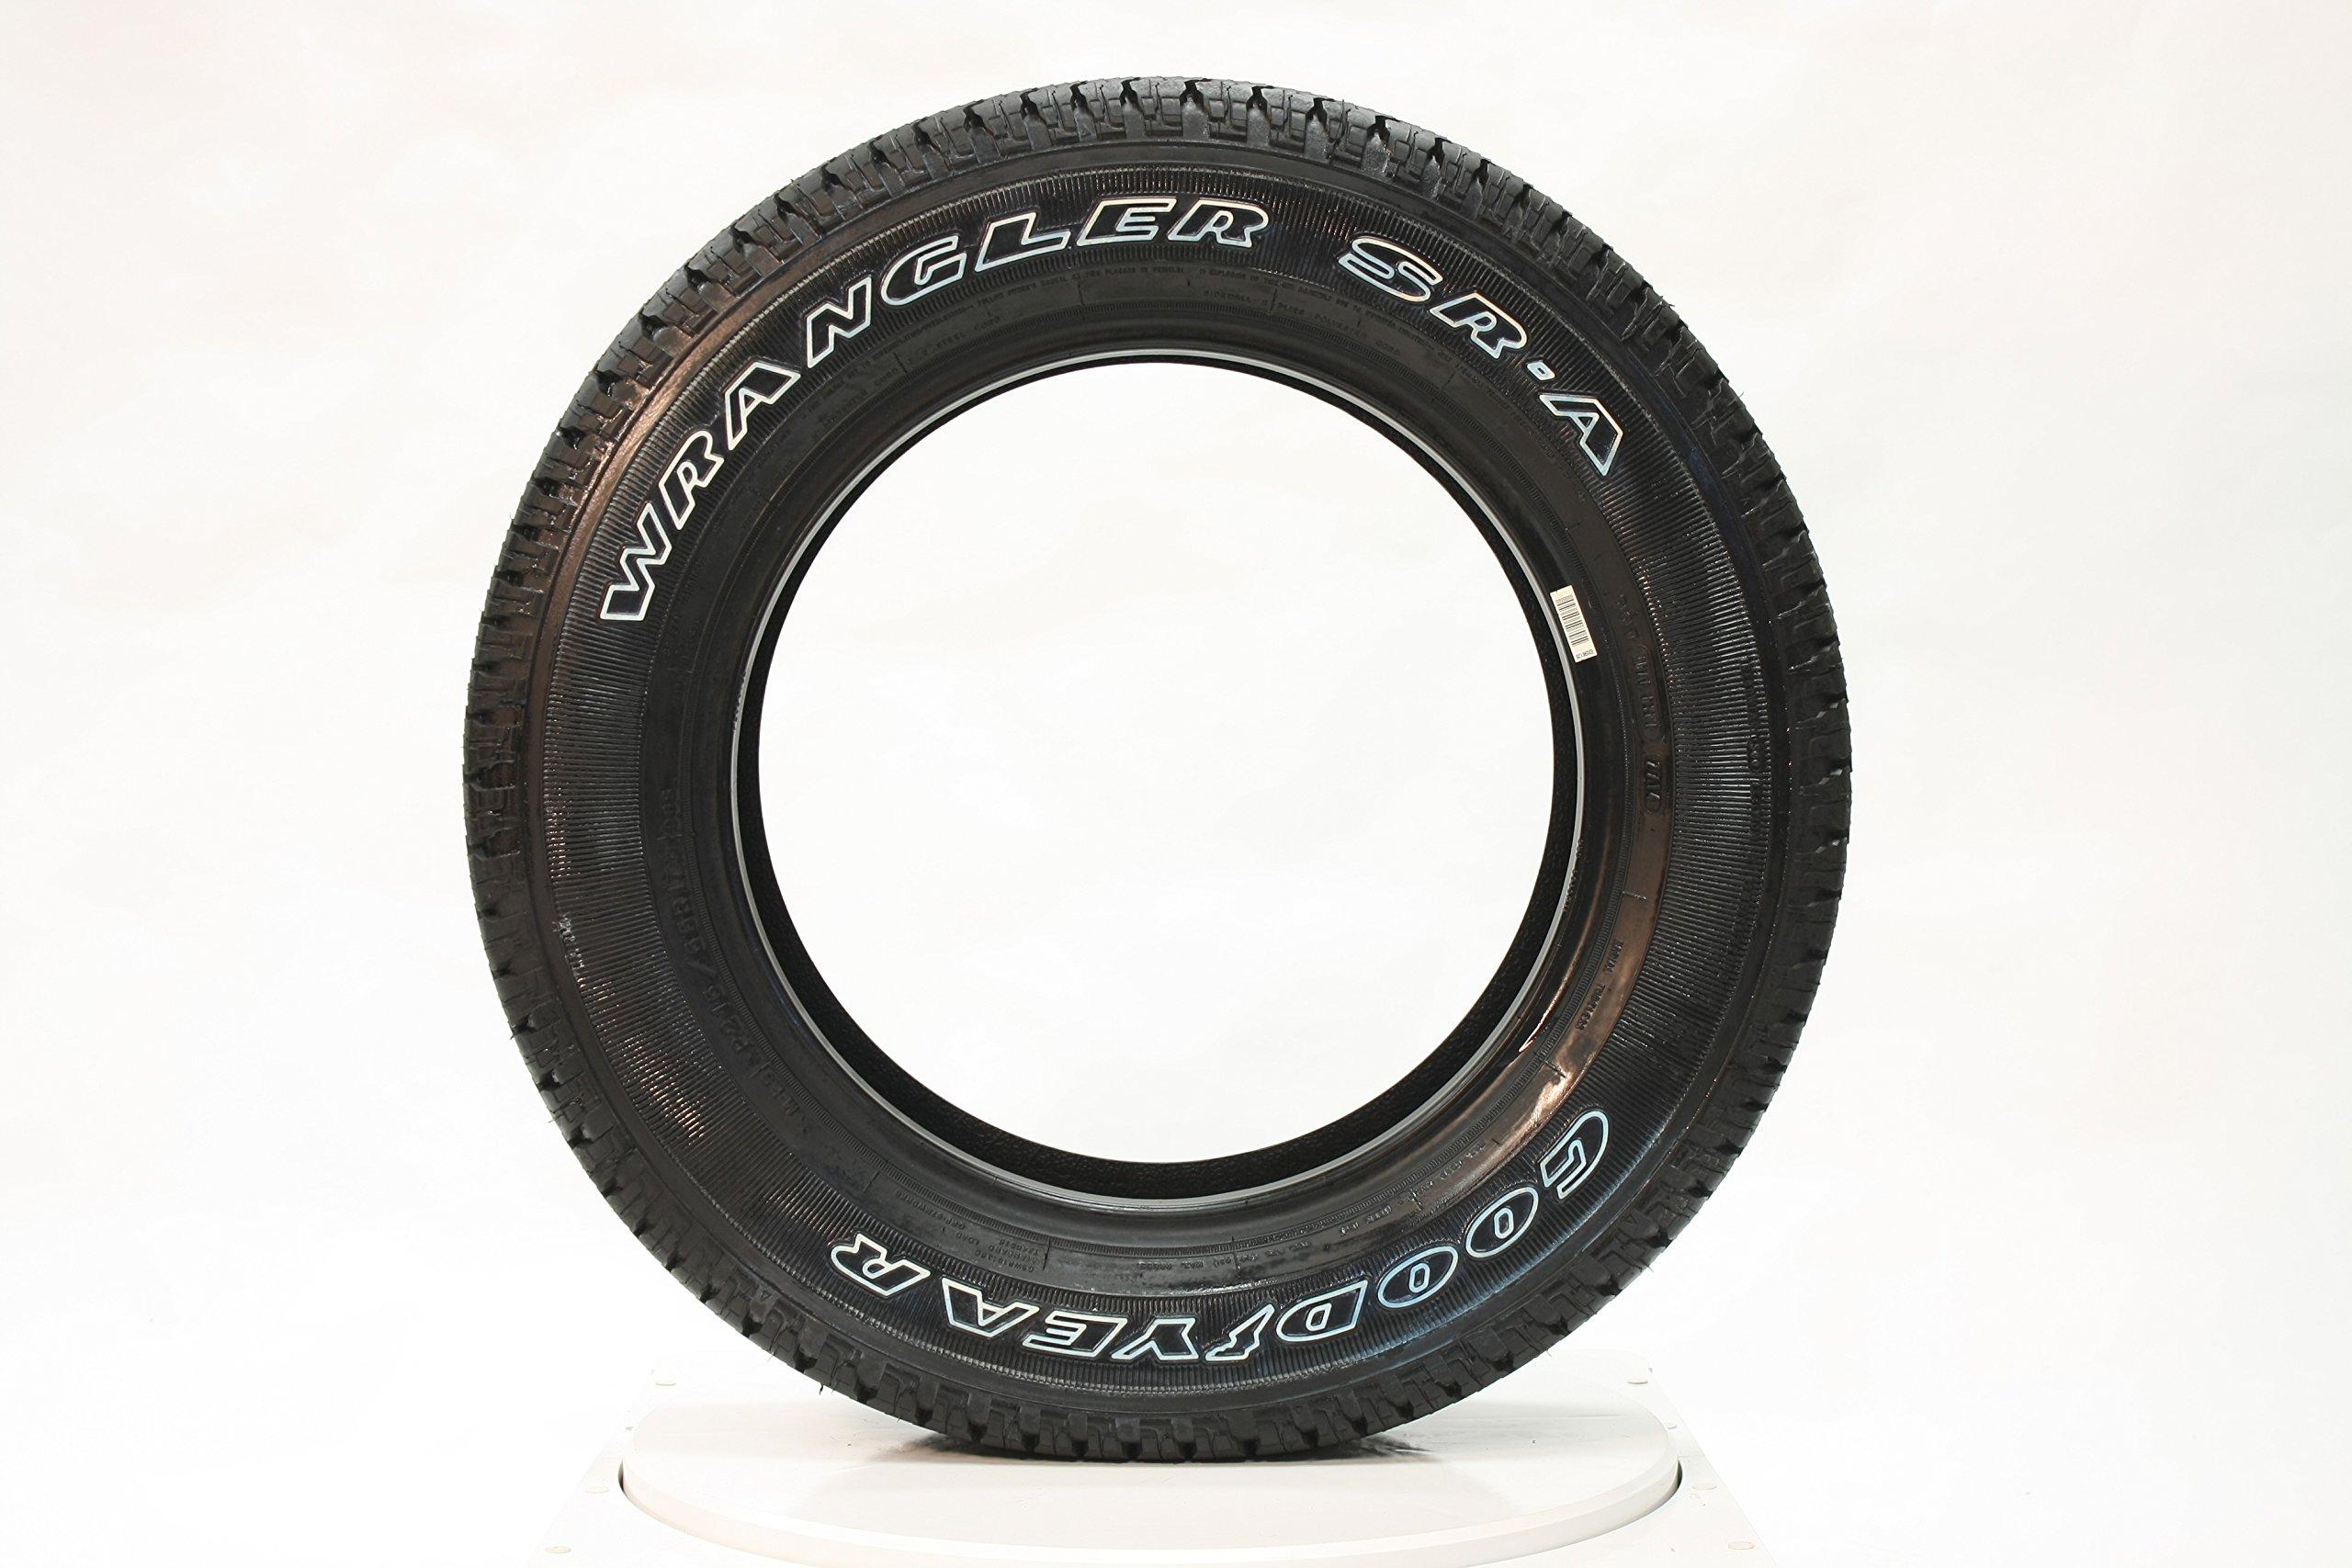 Goodyear Wrangler SR-A Radial Tire – 265/70R18 114S